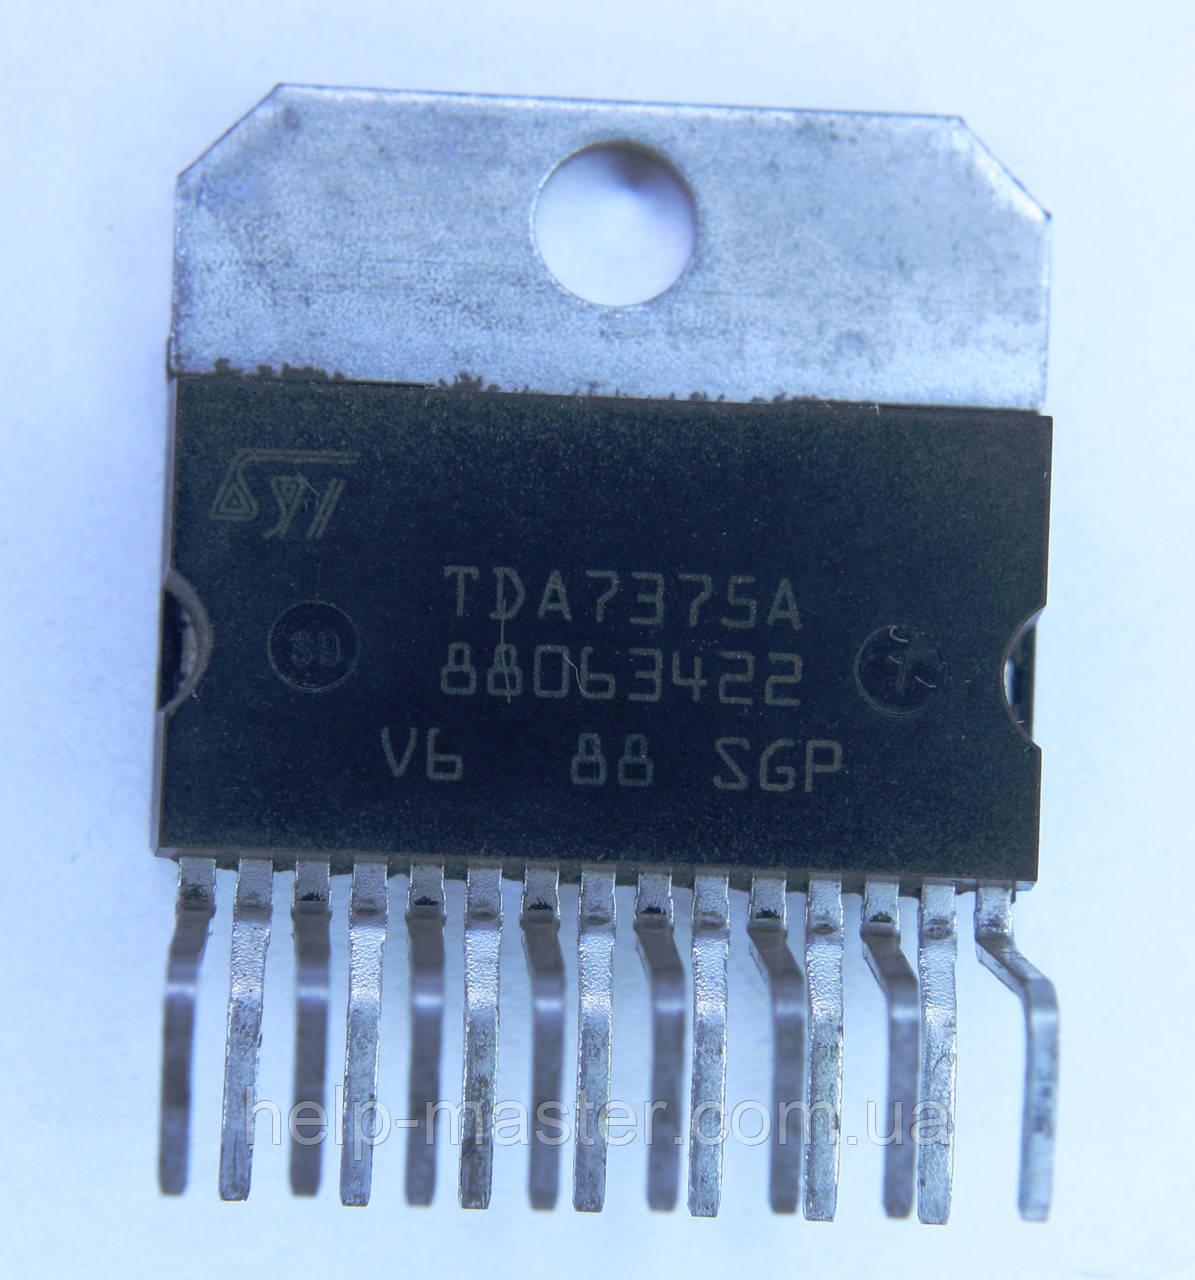 TDA7375A; (DBS15)